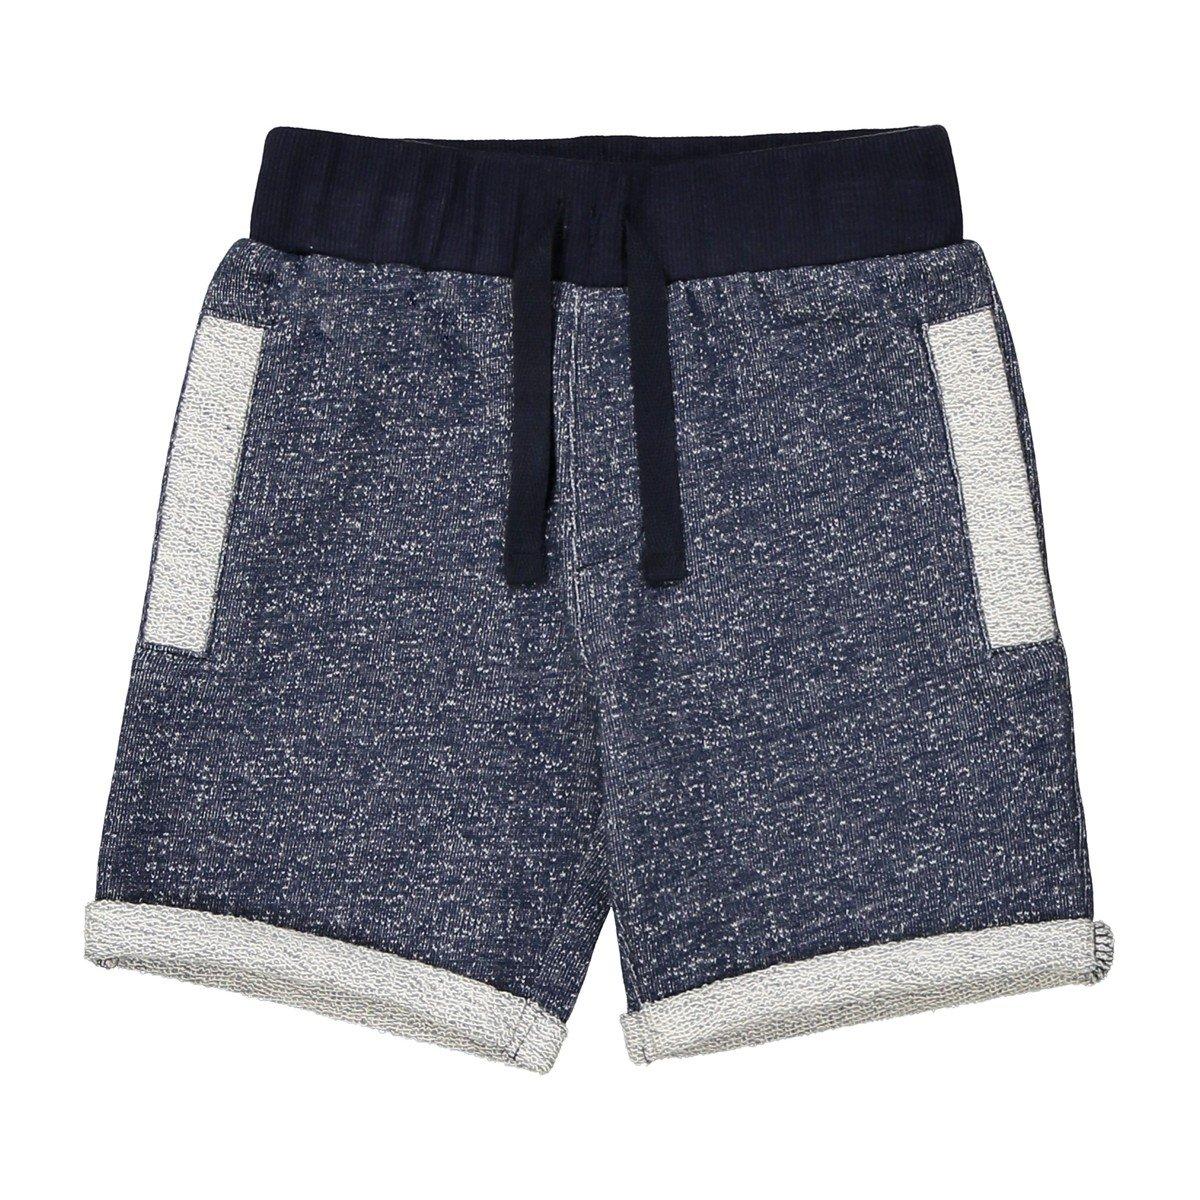 La Redoute R Edition Big Boys Bermuda Shorts 1 Month-3 Years